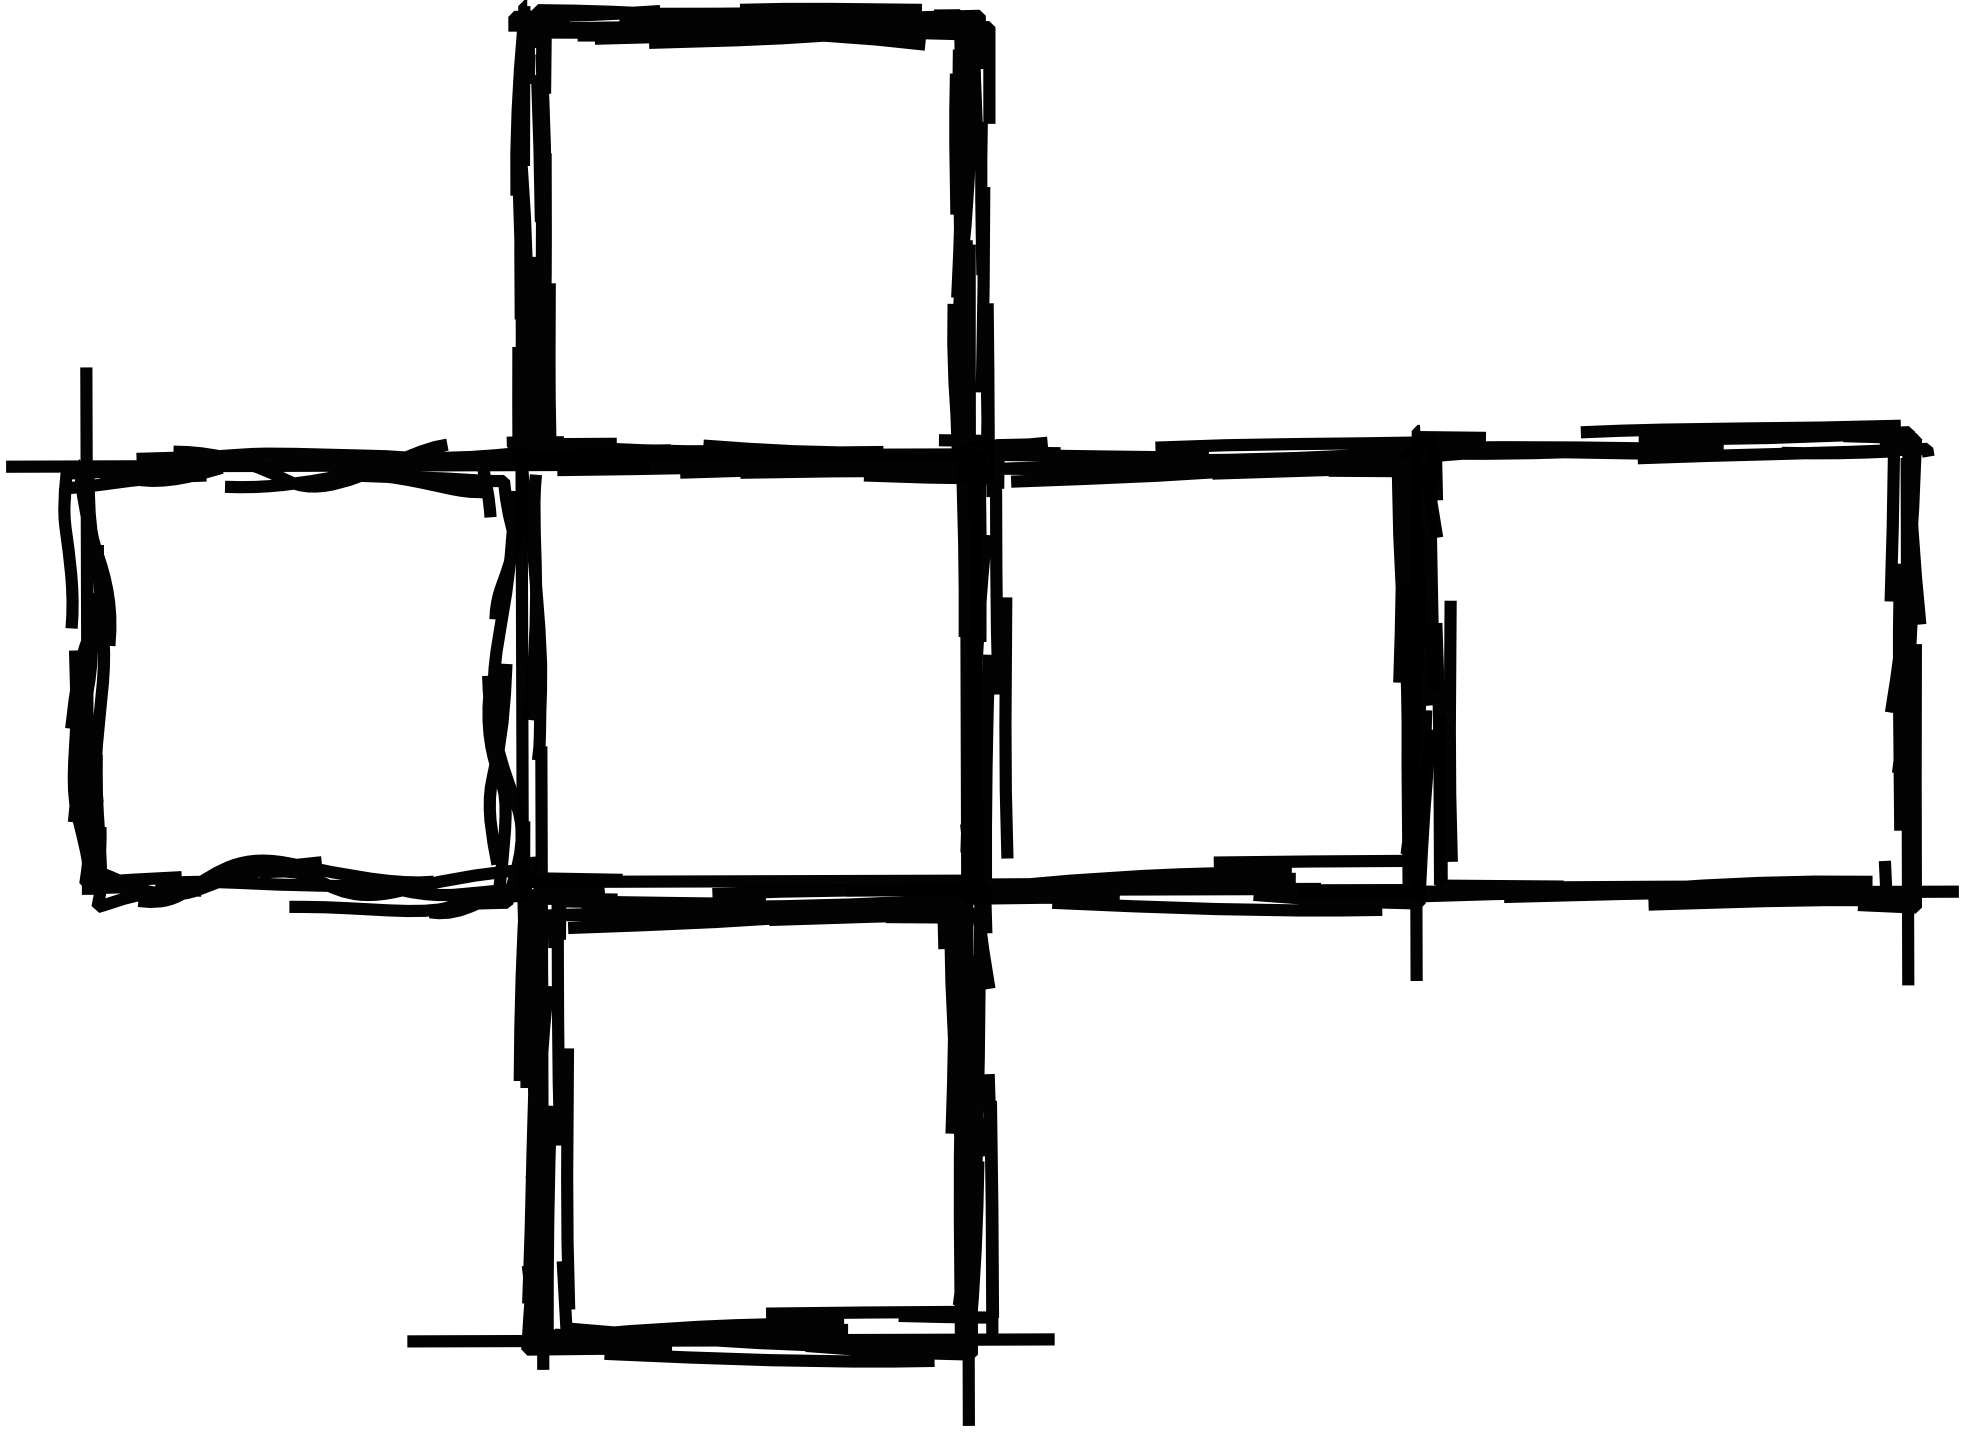 Cone Clipart Cuboid Shape Cone Cuboid Shape Transparent